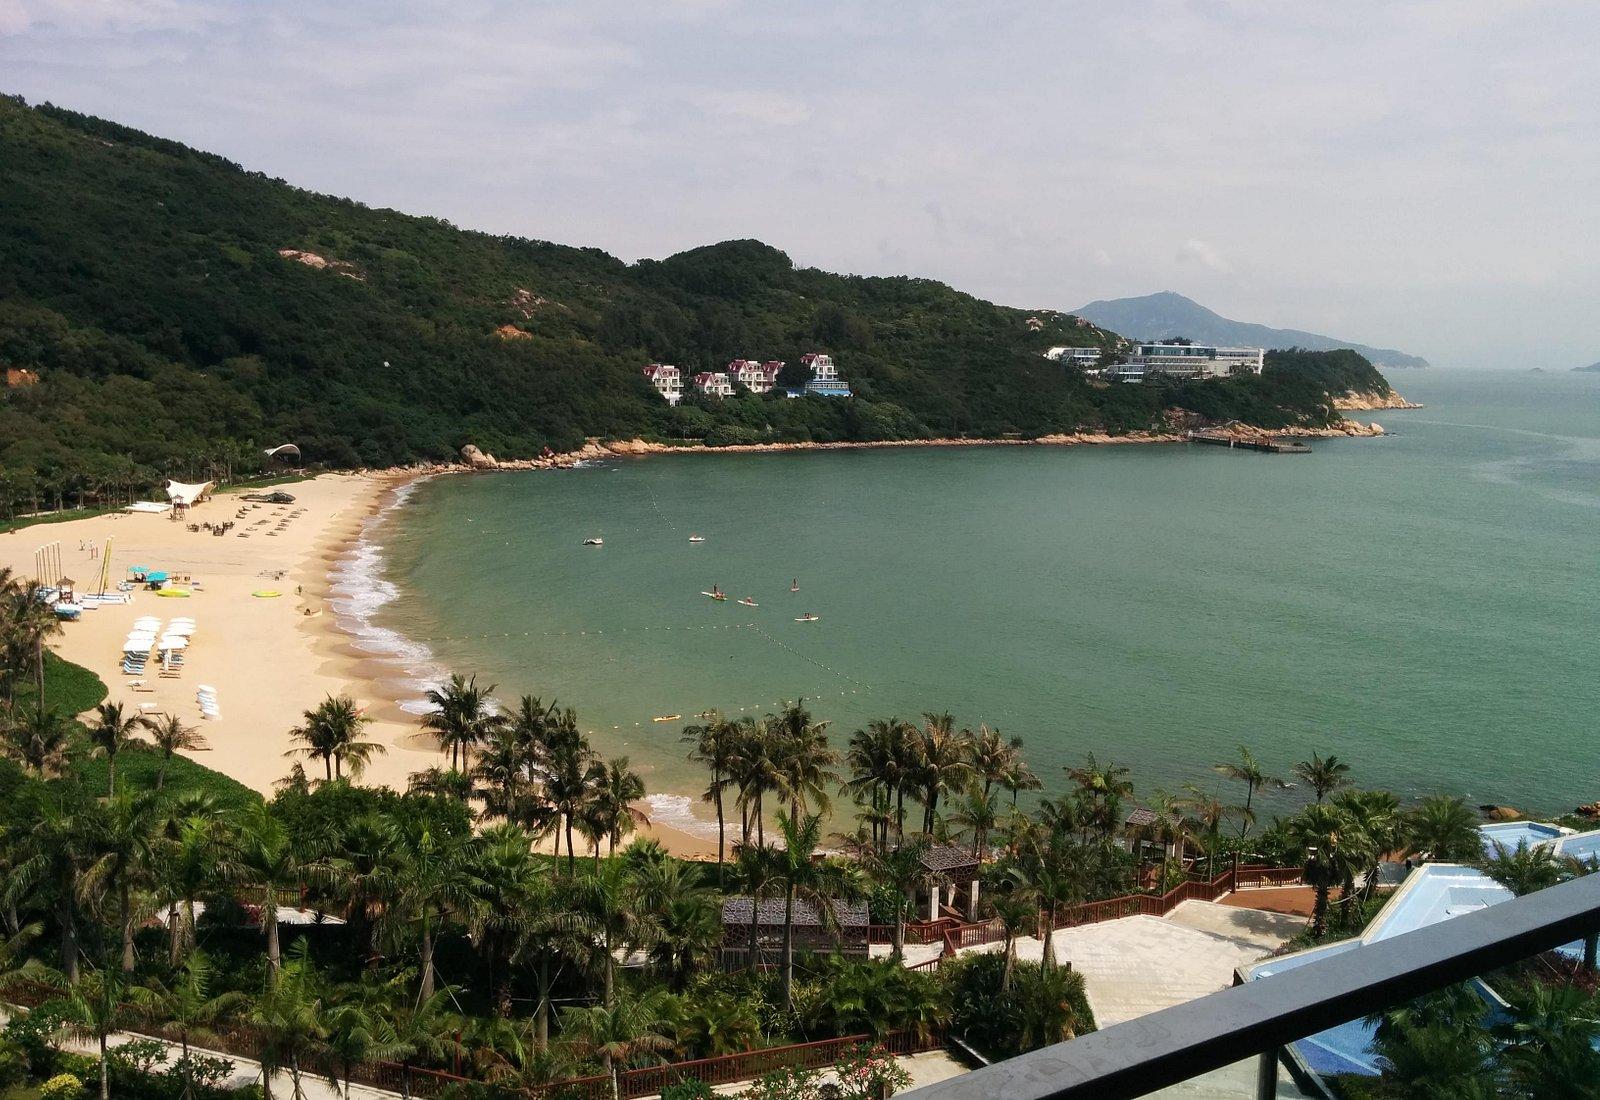 Nansha Bay